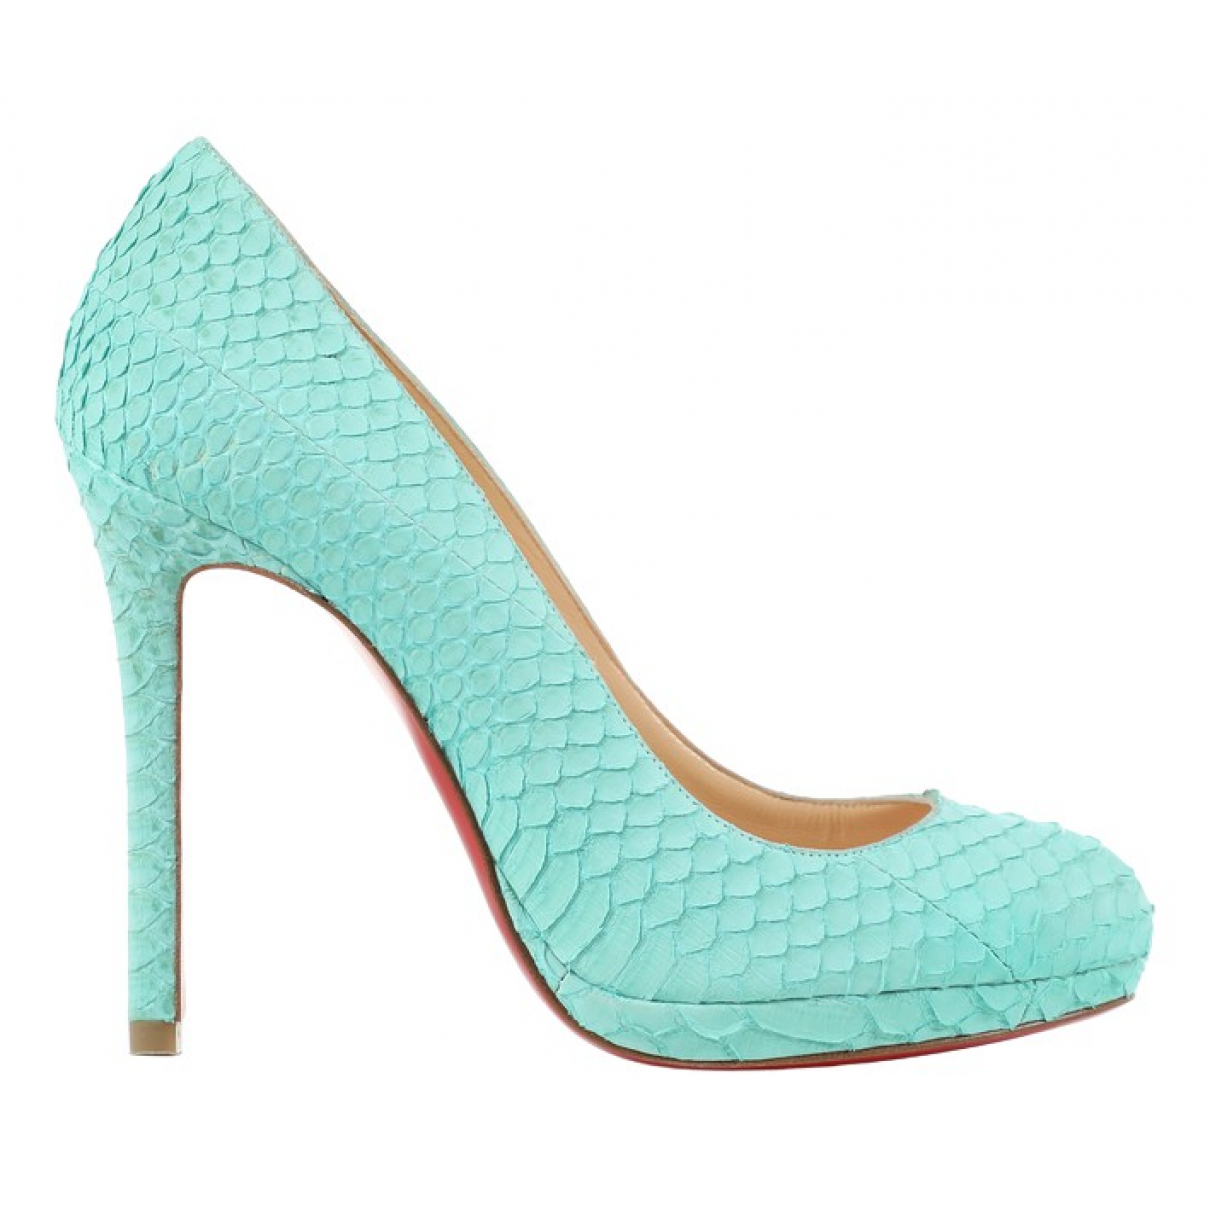 Christian Louboutin \N Turquoise Leather Heels for Women 35 EU